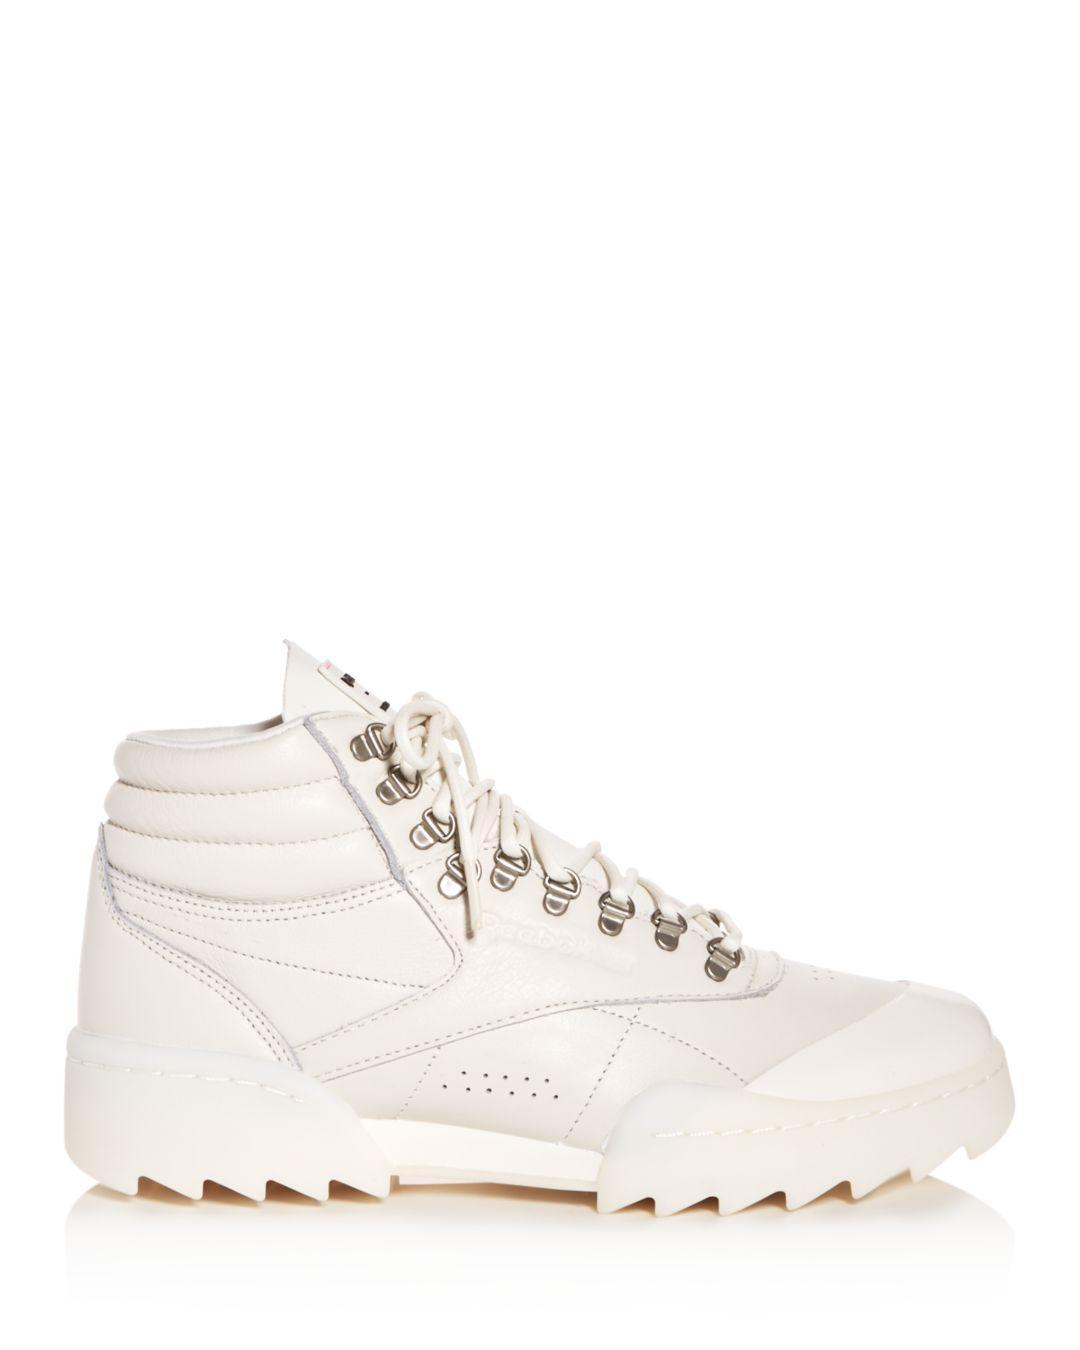 5e00686a31edc Lyst - Reebok Women s Freestyle Hi Nova Ripple X Gigi Hadid High-top  Sneakers